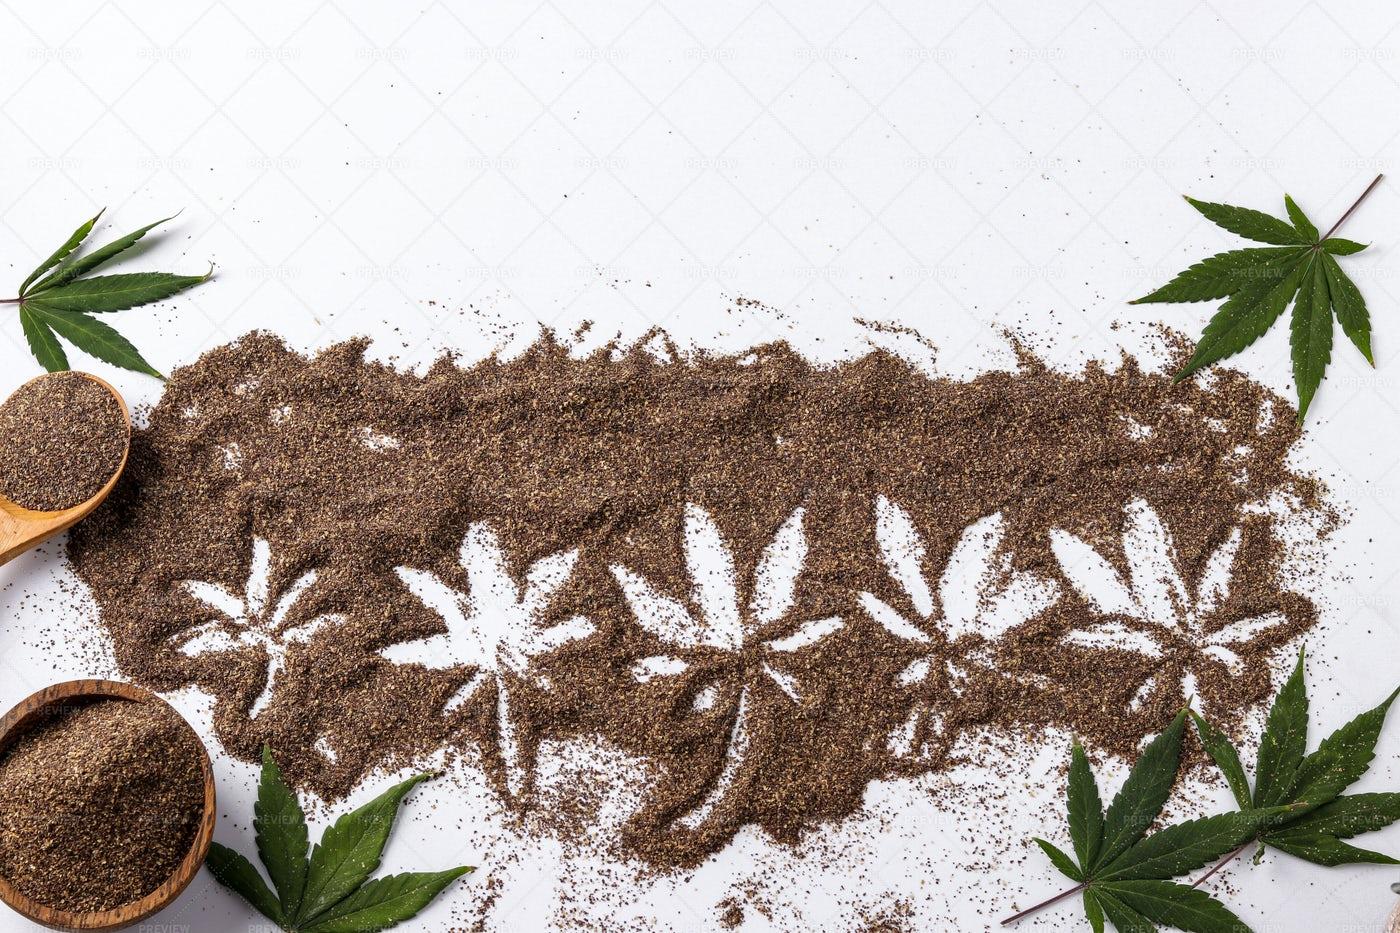 Bran Made From Cannabis: Stock Photos